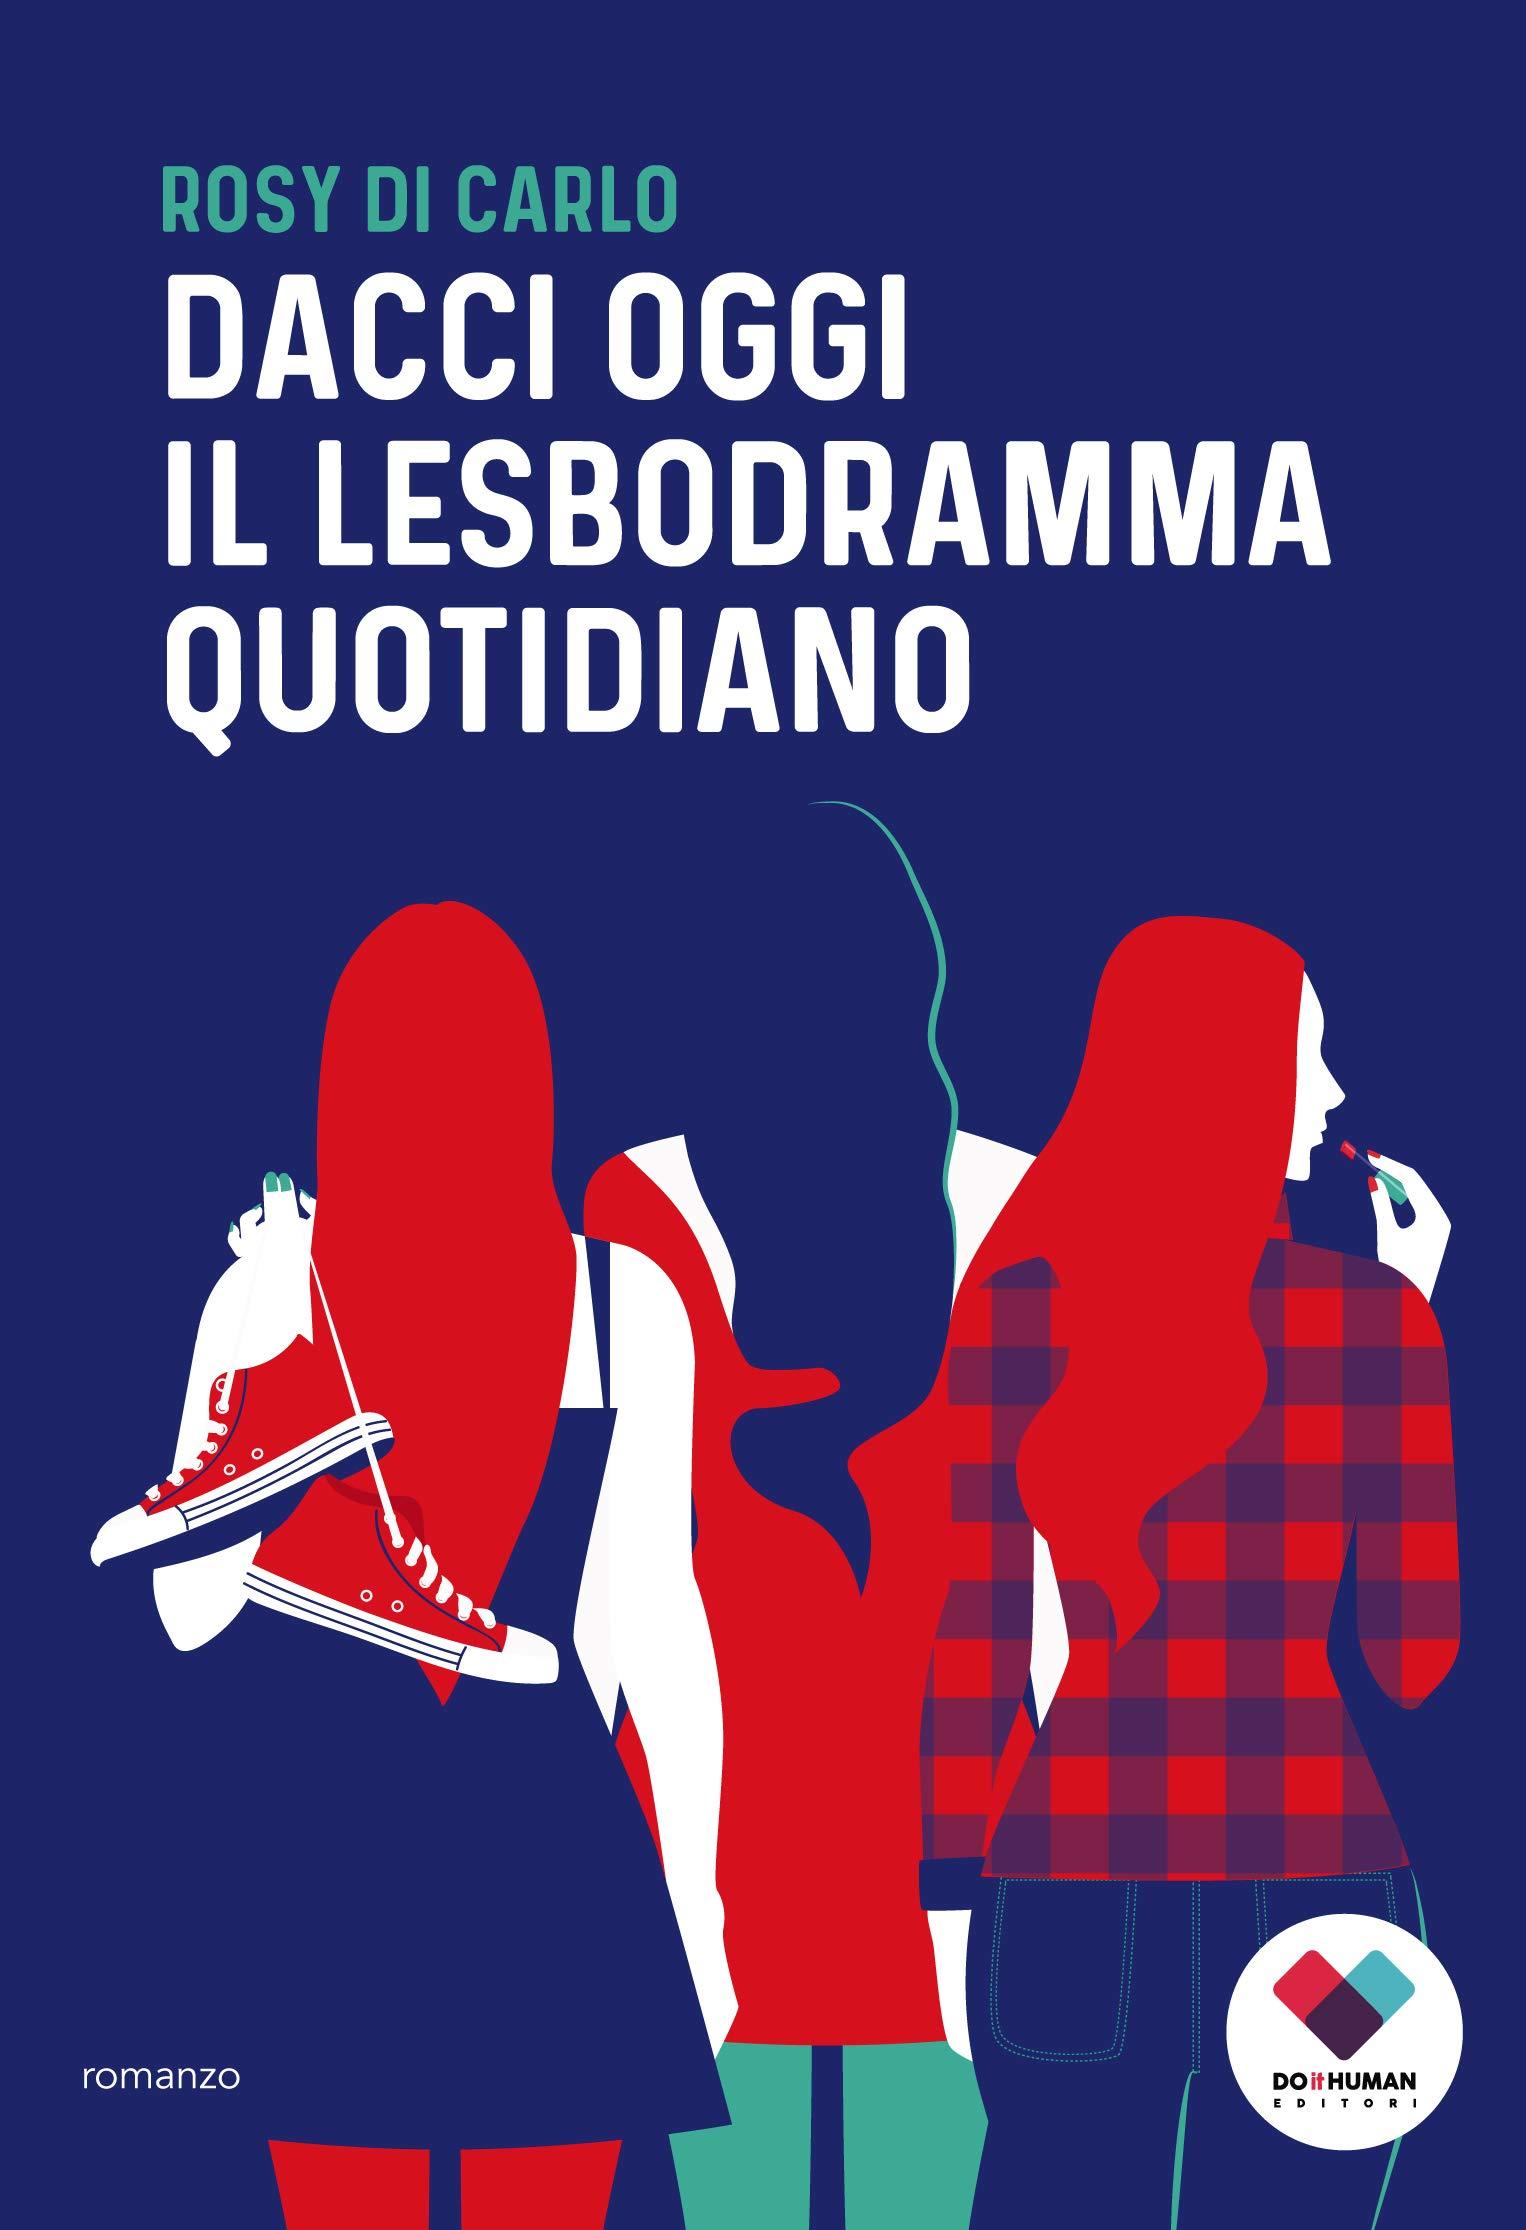 Dacci oggi il lesbodramma quotidiano: Amazon.es: Di Carlo, Rosy: Libros en idiomas extranjeros